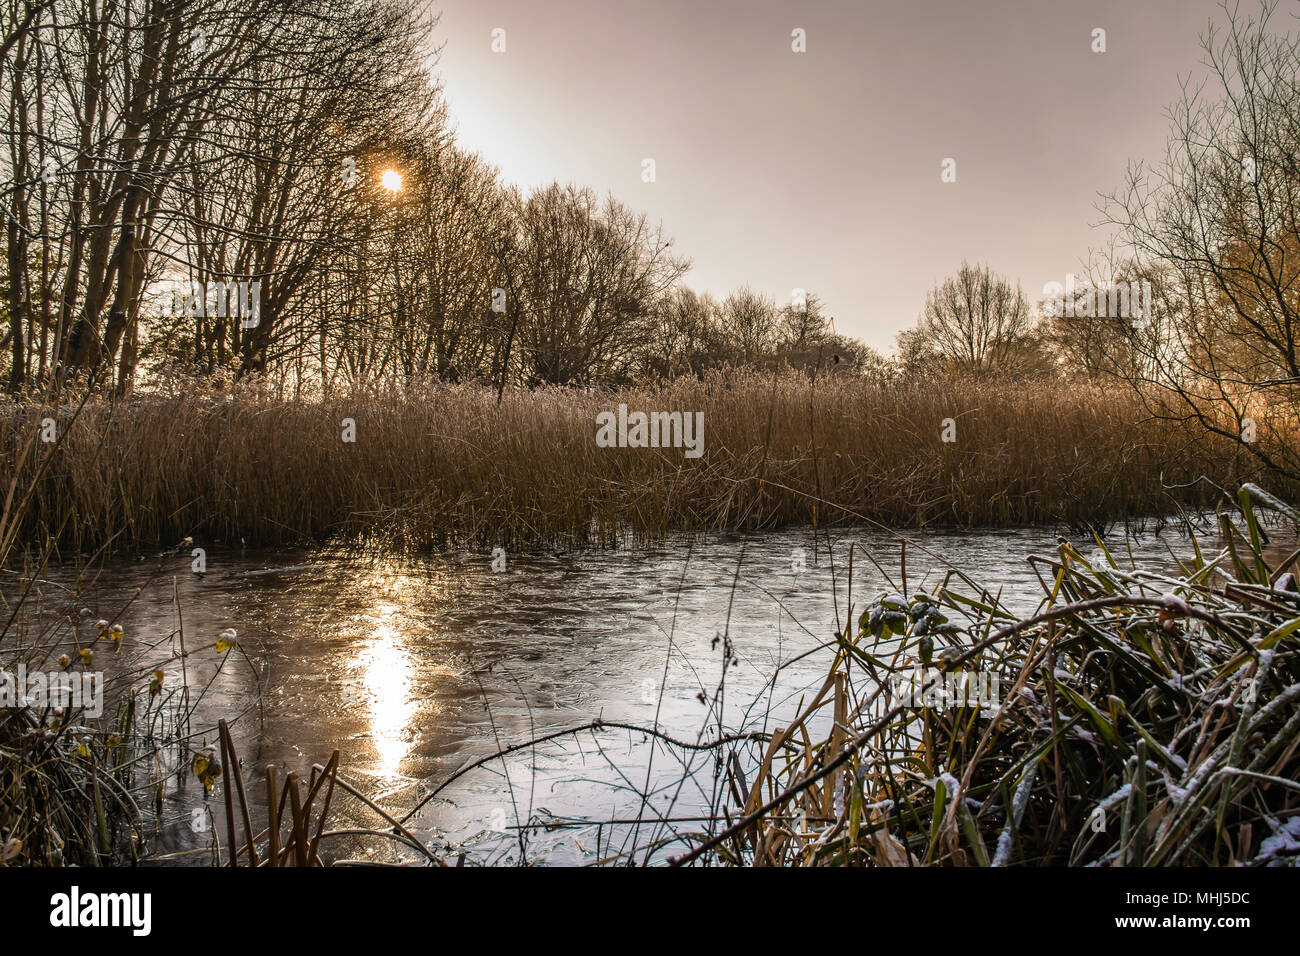 Westport lake on winter day.Stoke on Trent ,Staffordshire,Uk.Sun reflection in frozen pond.Staffordshire landscape uk.Tranquility,beautiful morning. - Stock Image